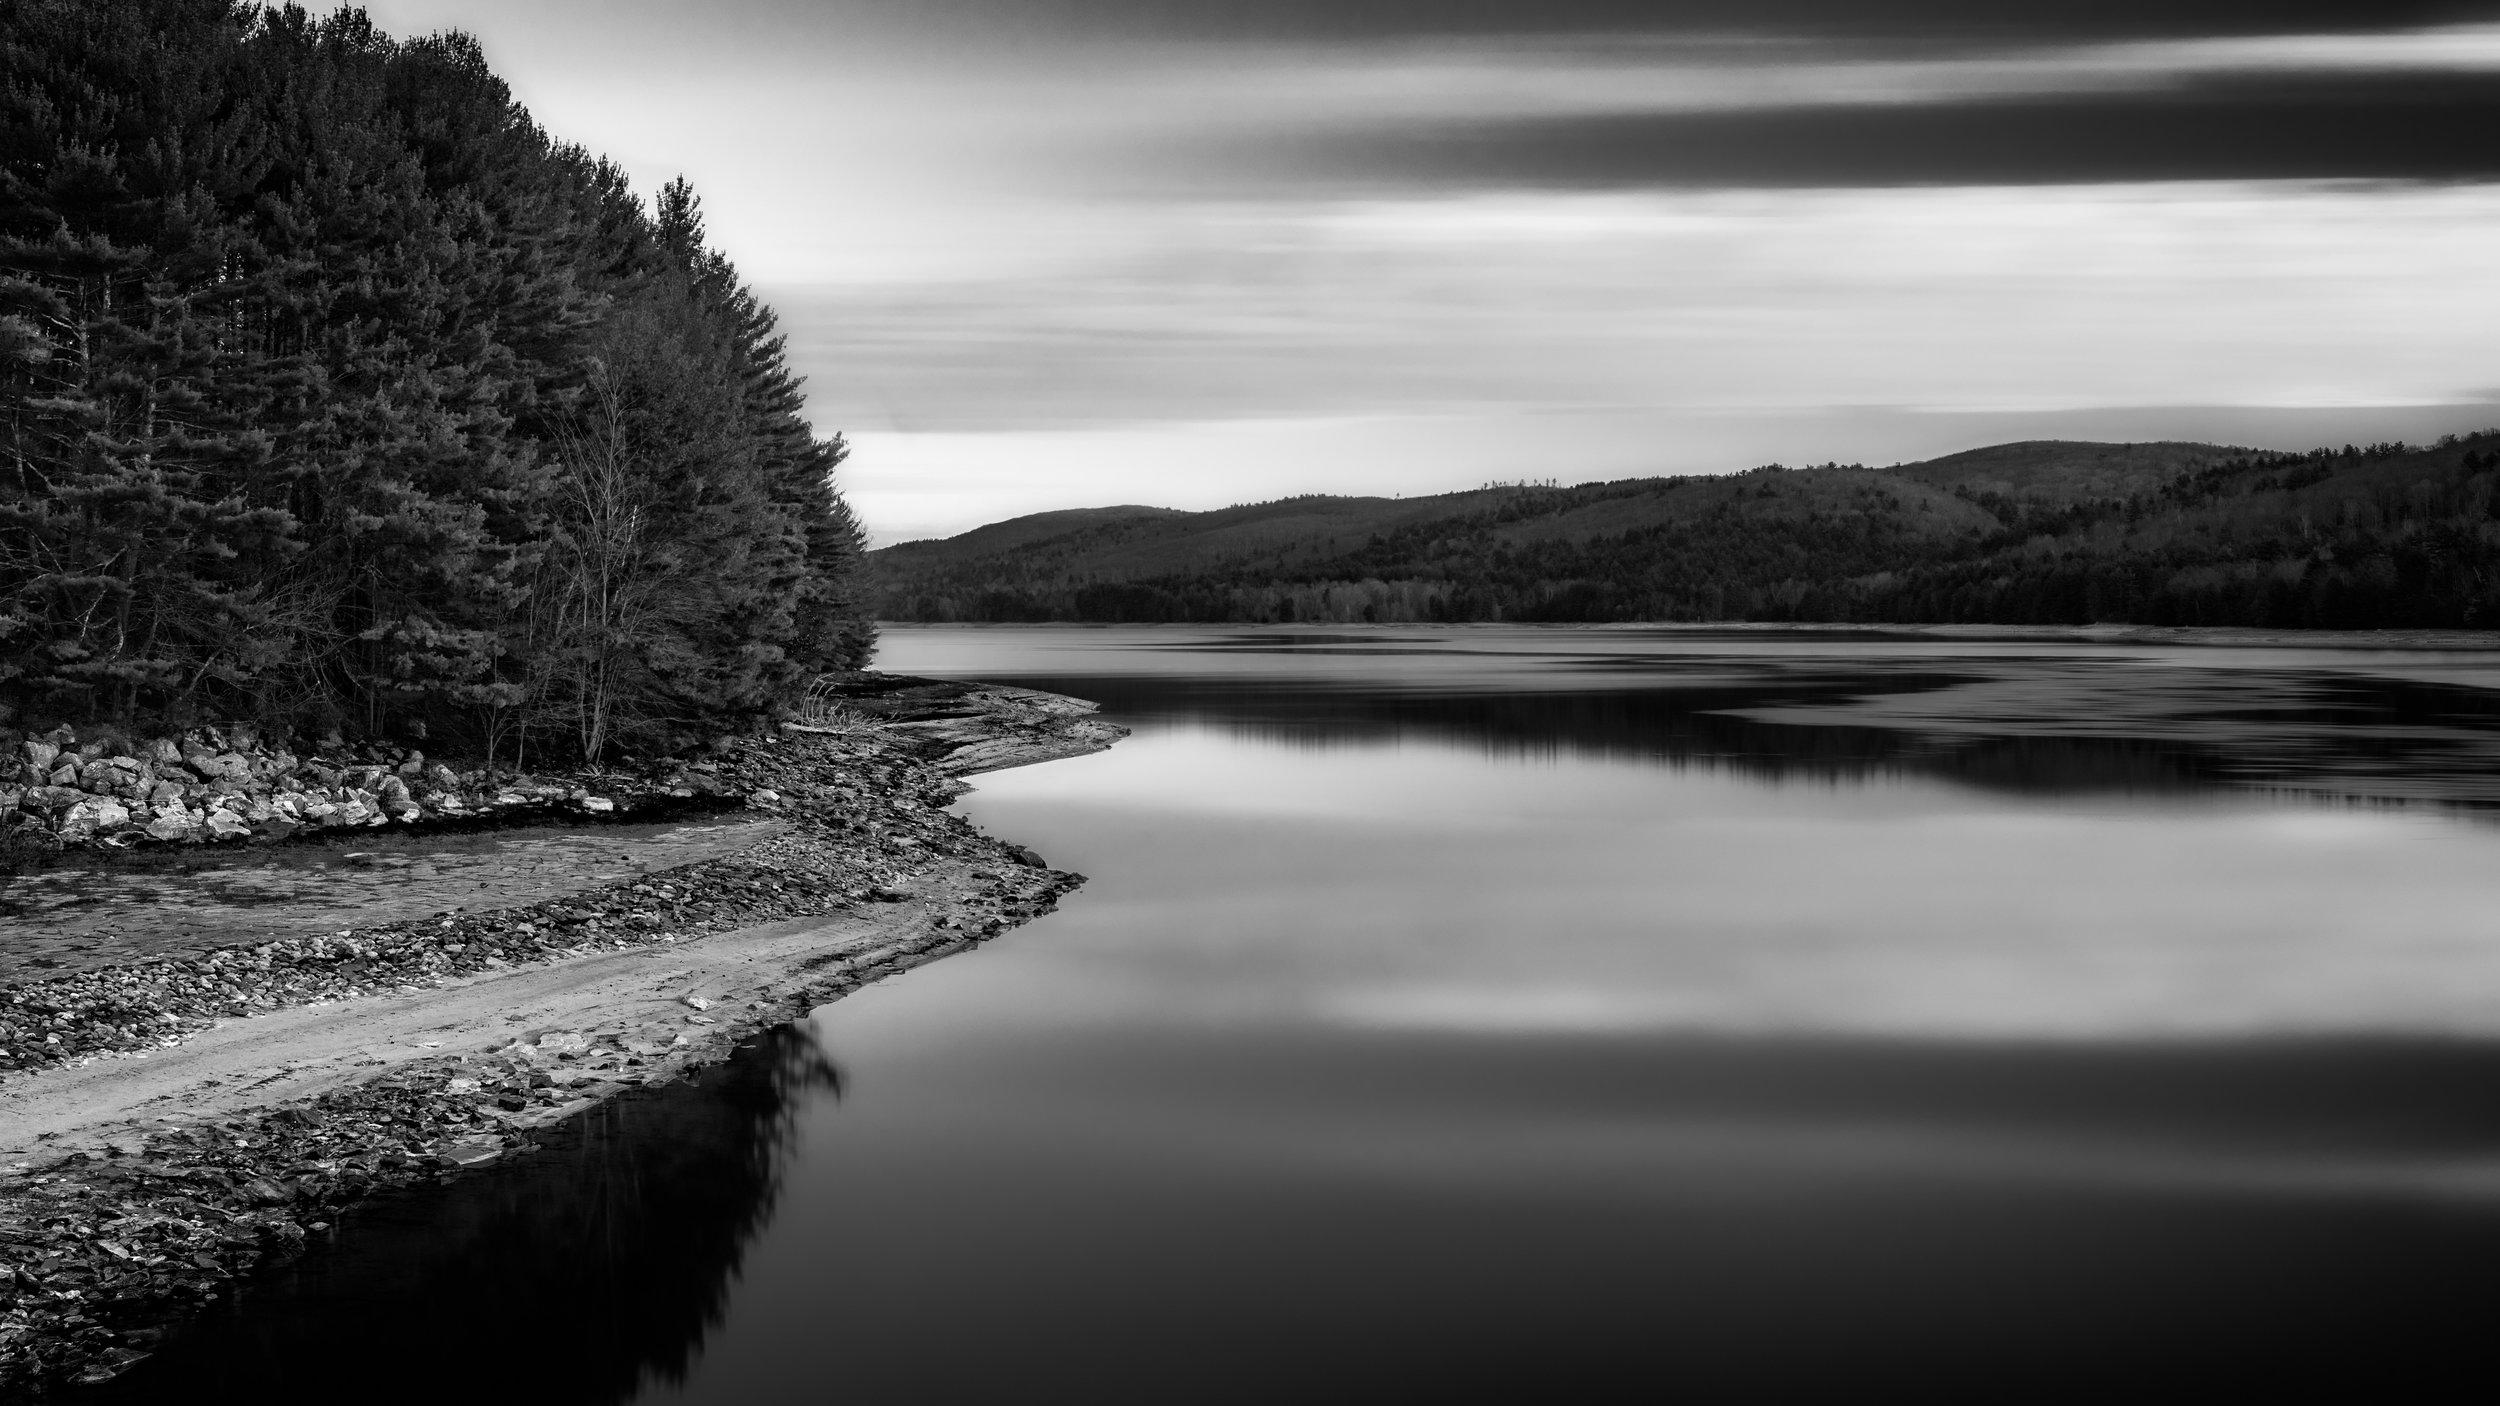 Waters of Serenity